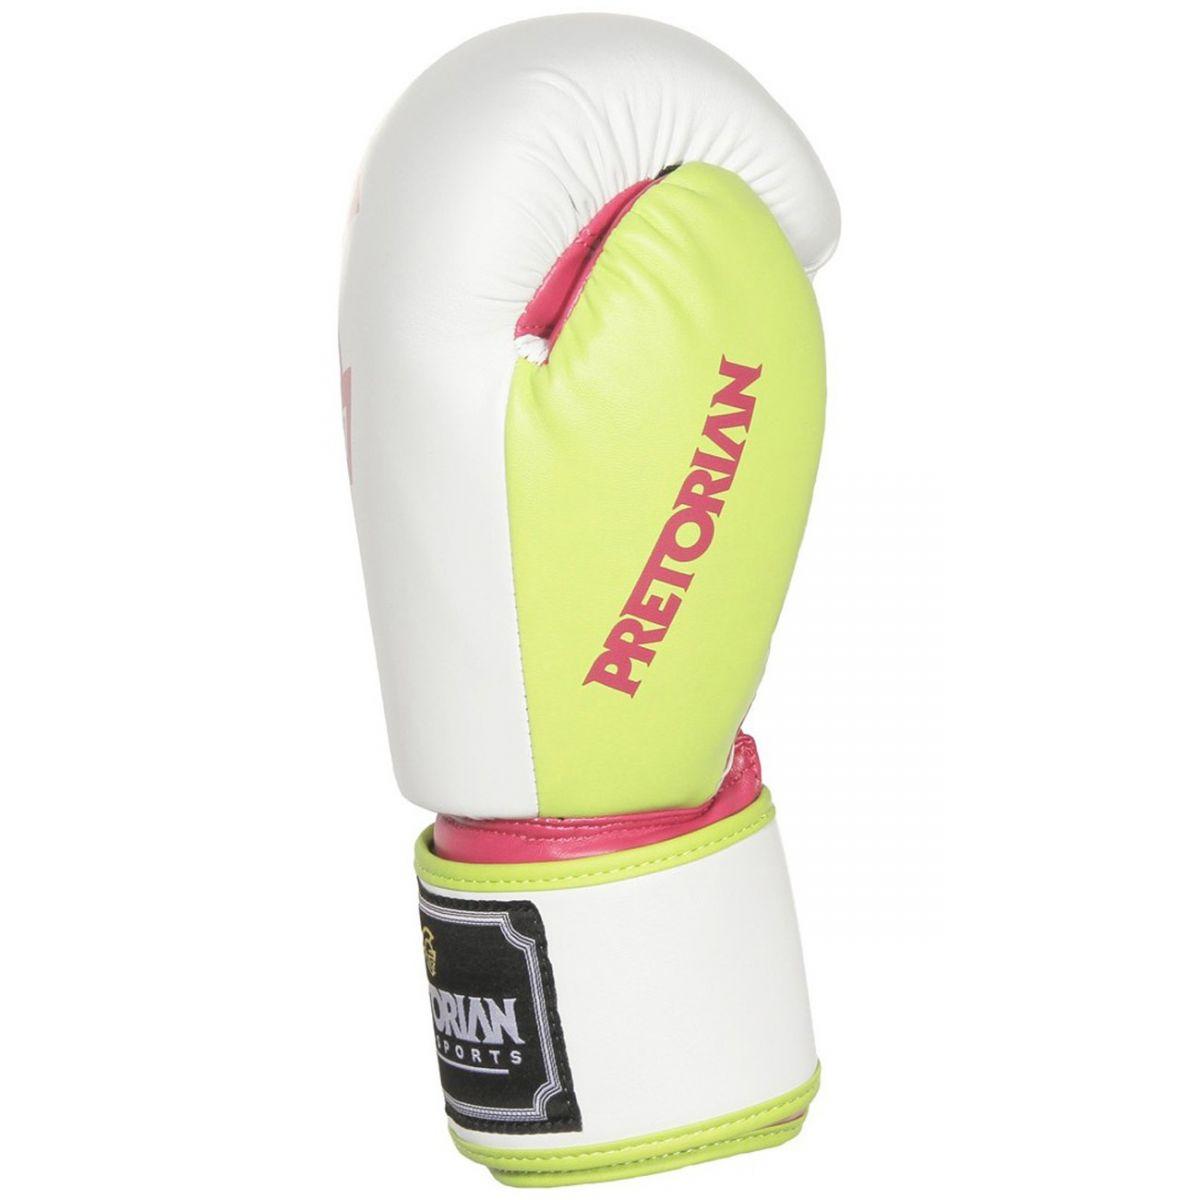 Luvas Boxe / Muay Thai - Training Series - Rosa/Branco/Verde- Pretorian - 10/12/14/16 OZ .  - Loja do Competidor